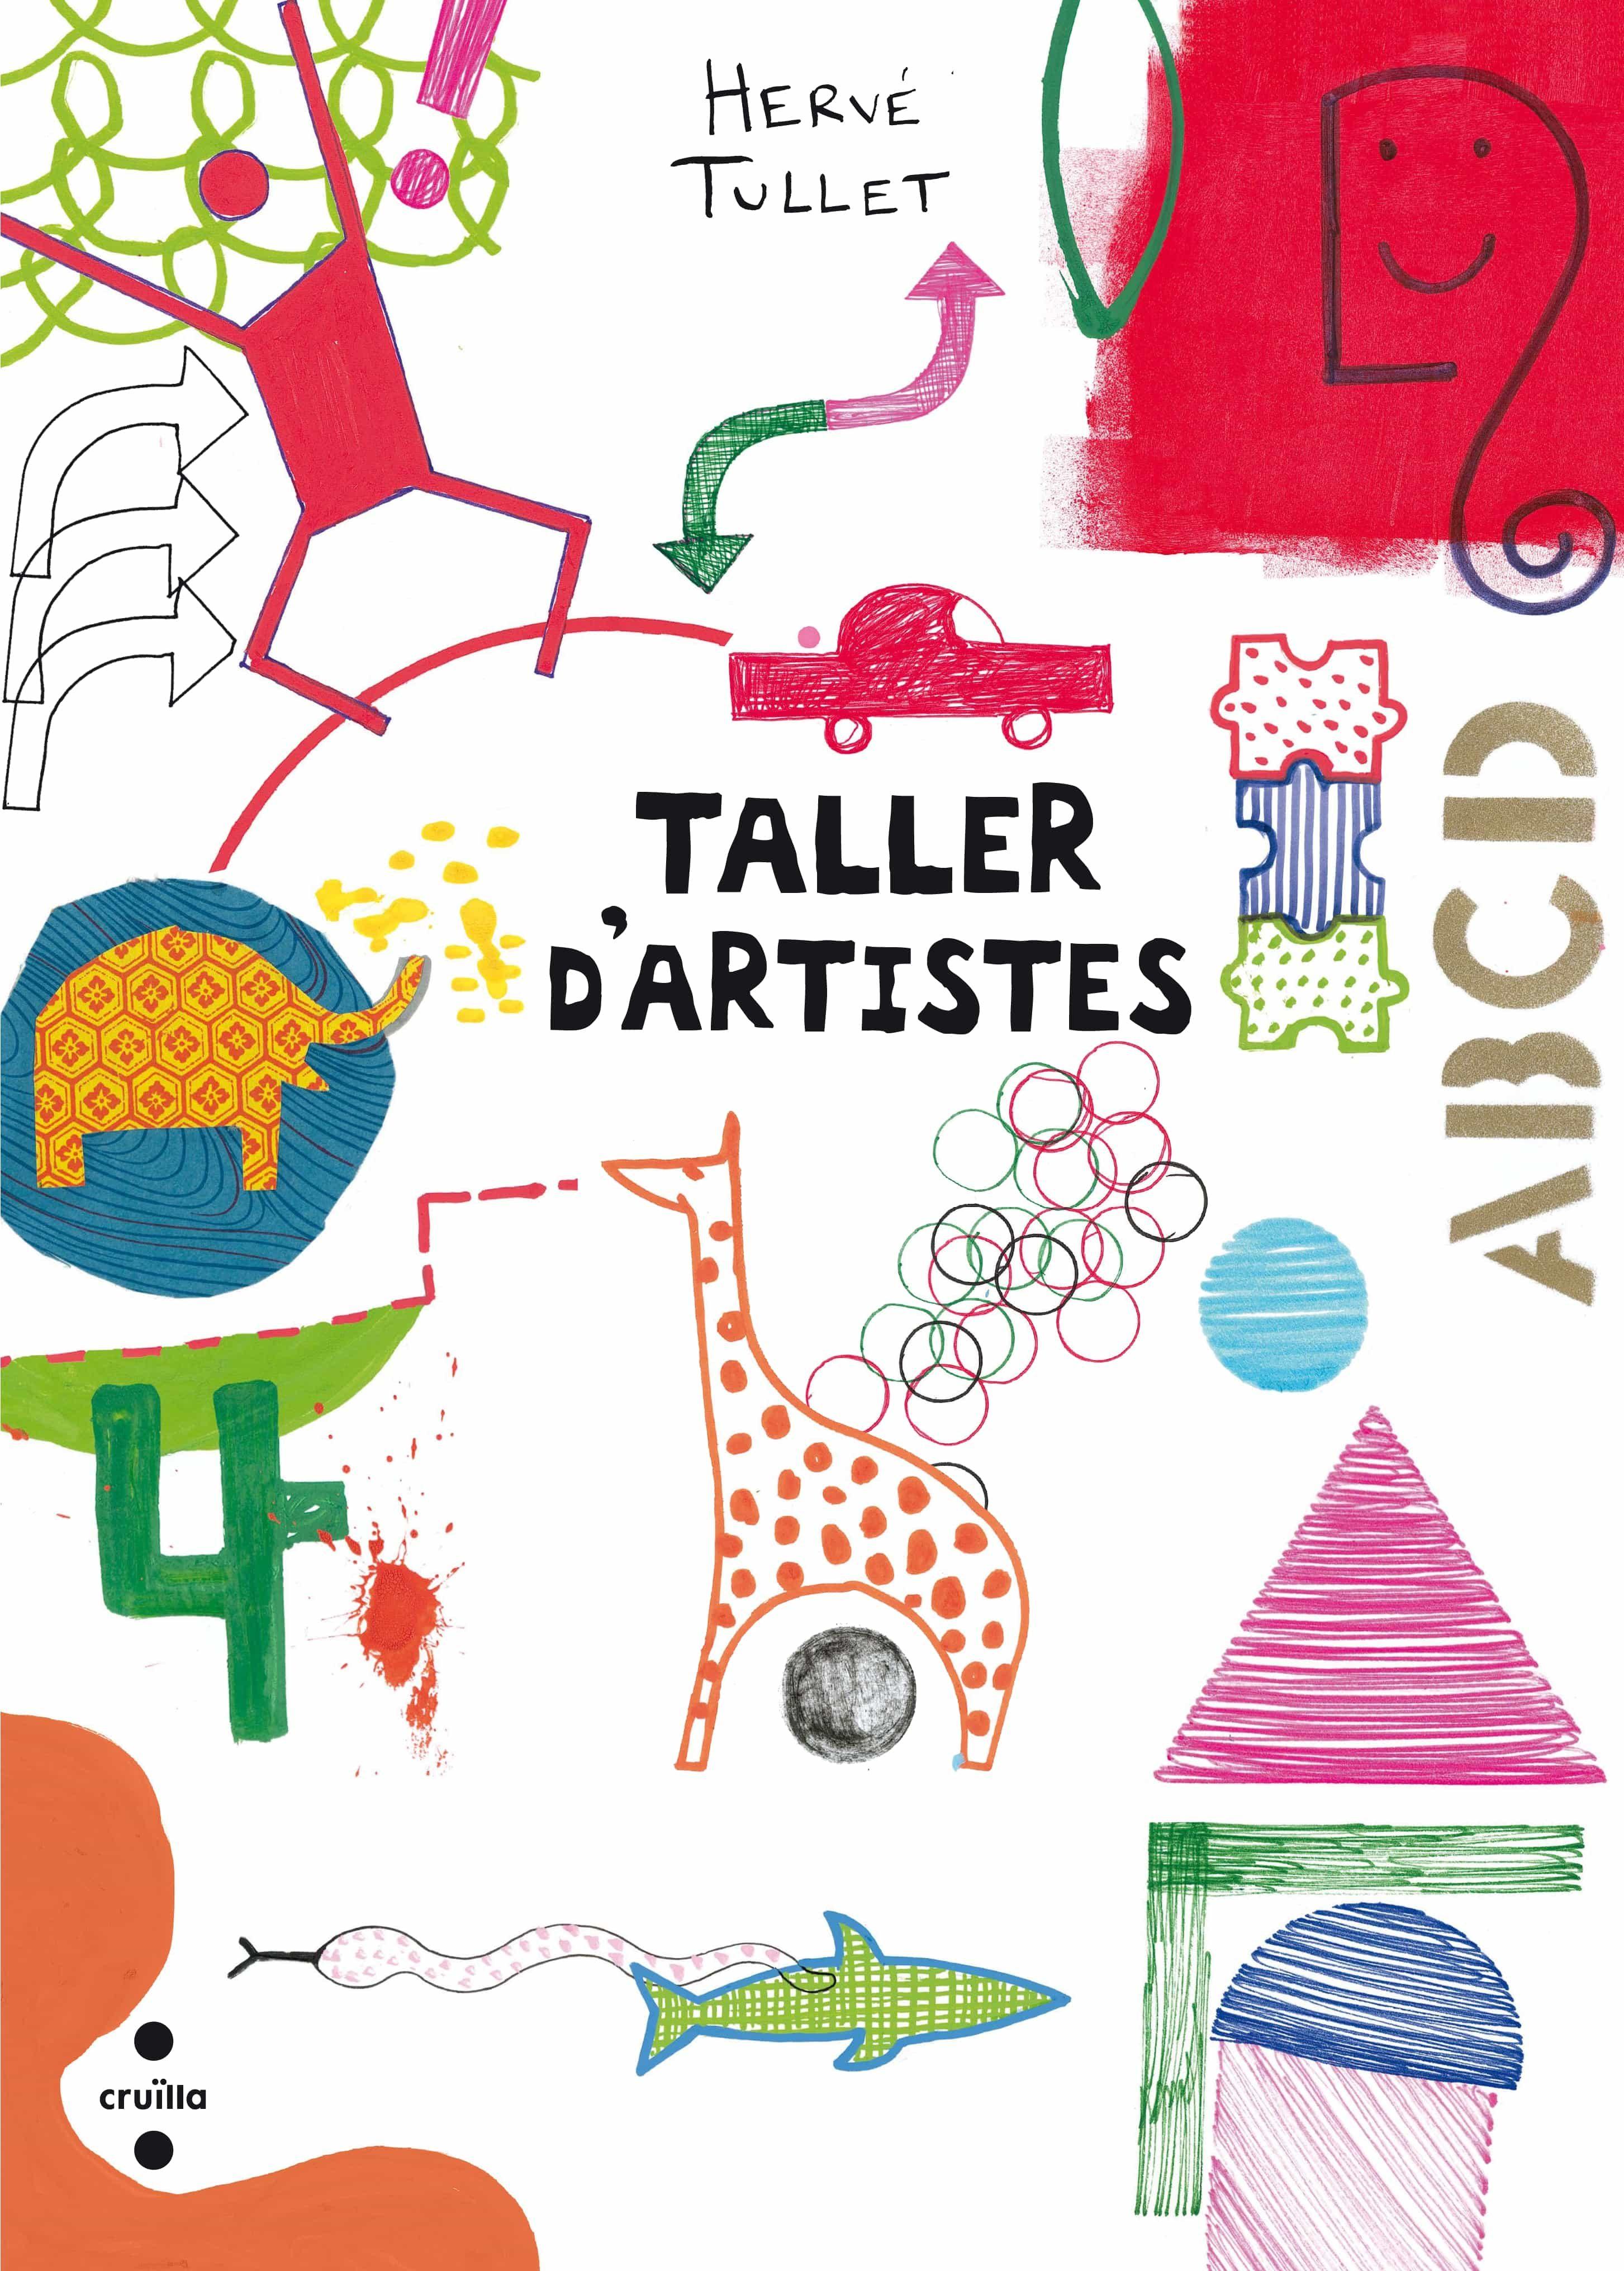 taller d artistes-herve tullet-9788466139816